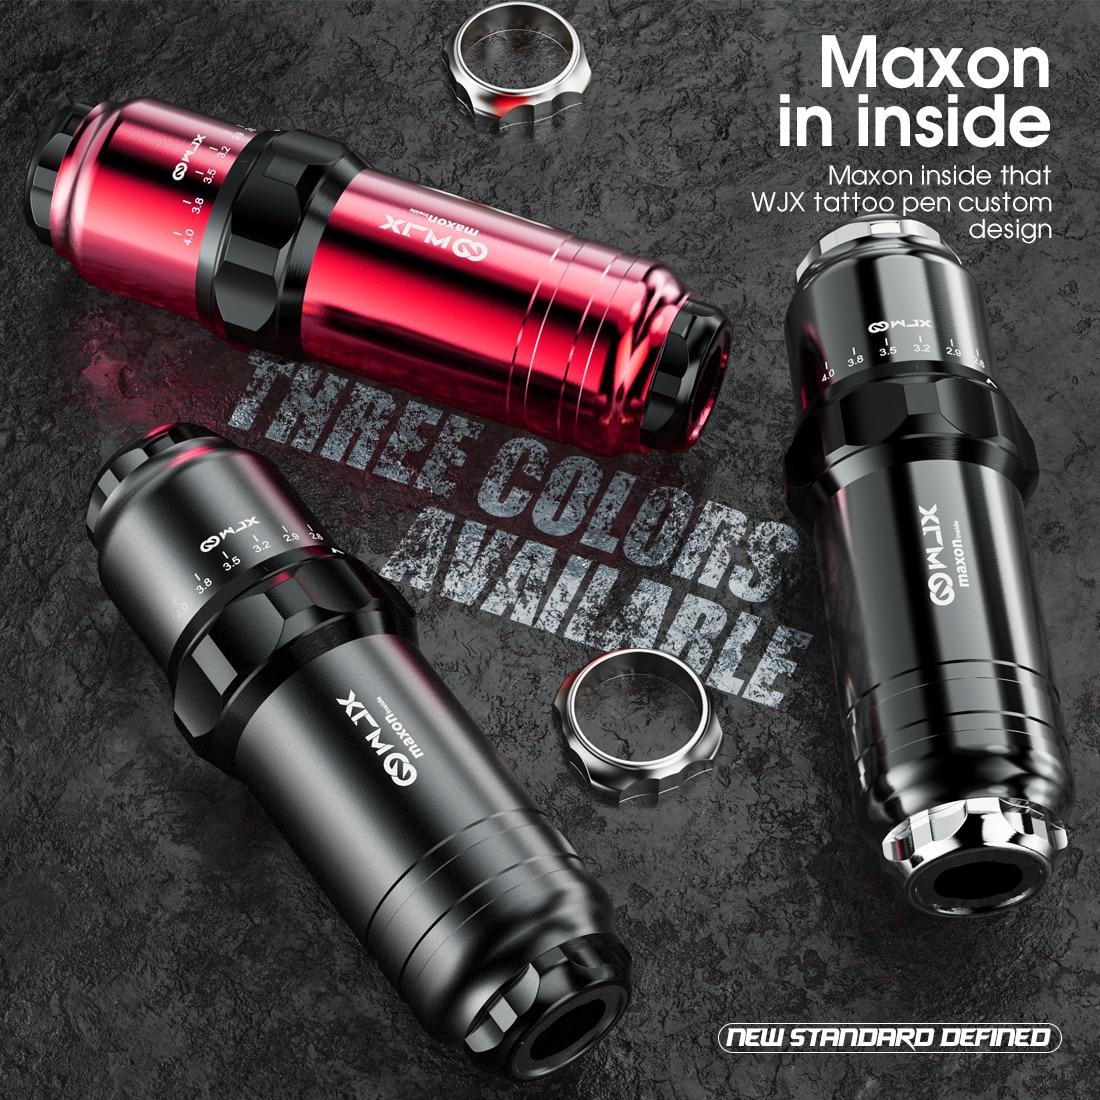 Top Maxon Motor Professional Six Stroke Length Options Rotary Tattoo Machine Permanent Makeup Machine WJX Tattoo Pen